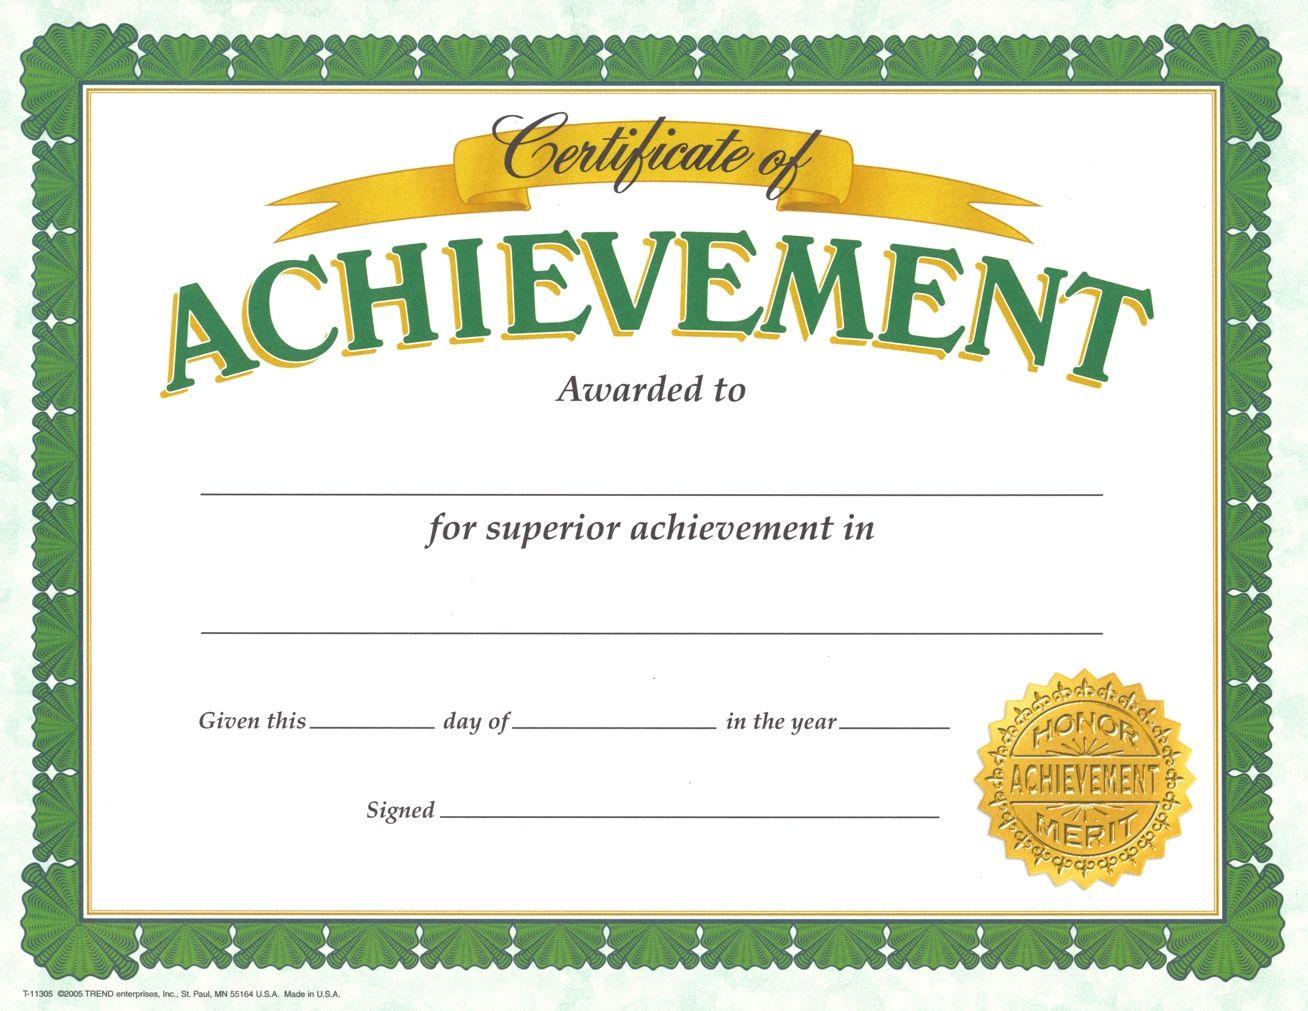 Sports Certificate Templates | Certificate Template Downloads in Free Student Certificate Templates - Atlantaauctionco.com